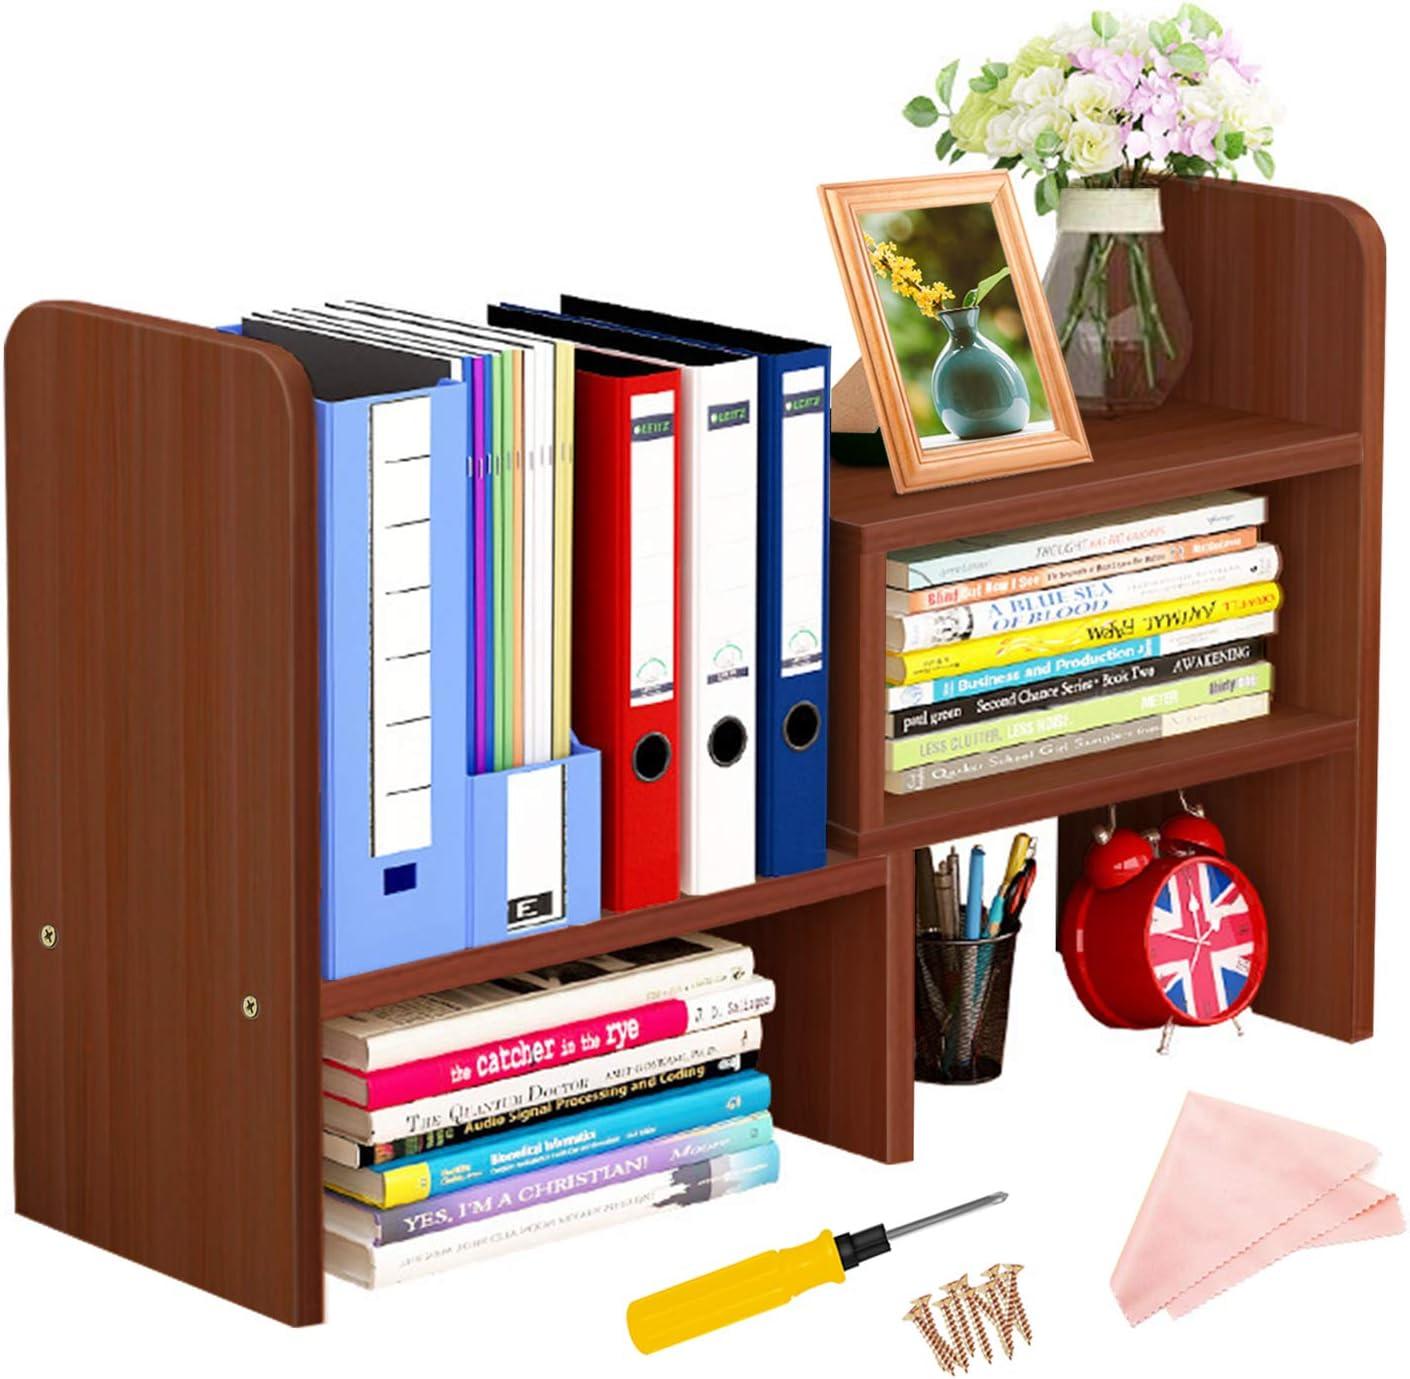 Desktop Bookshelf Adjustable Desktop Display Shelf Desk Storage Rack Wood Desk Organizer Multipurpose Bookshelf Large Office Countertop Bookcase Shelves for Office, Home Decor, Kitchen(Brown)